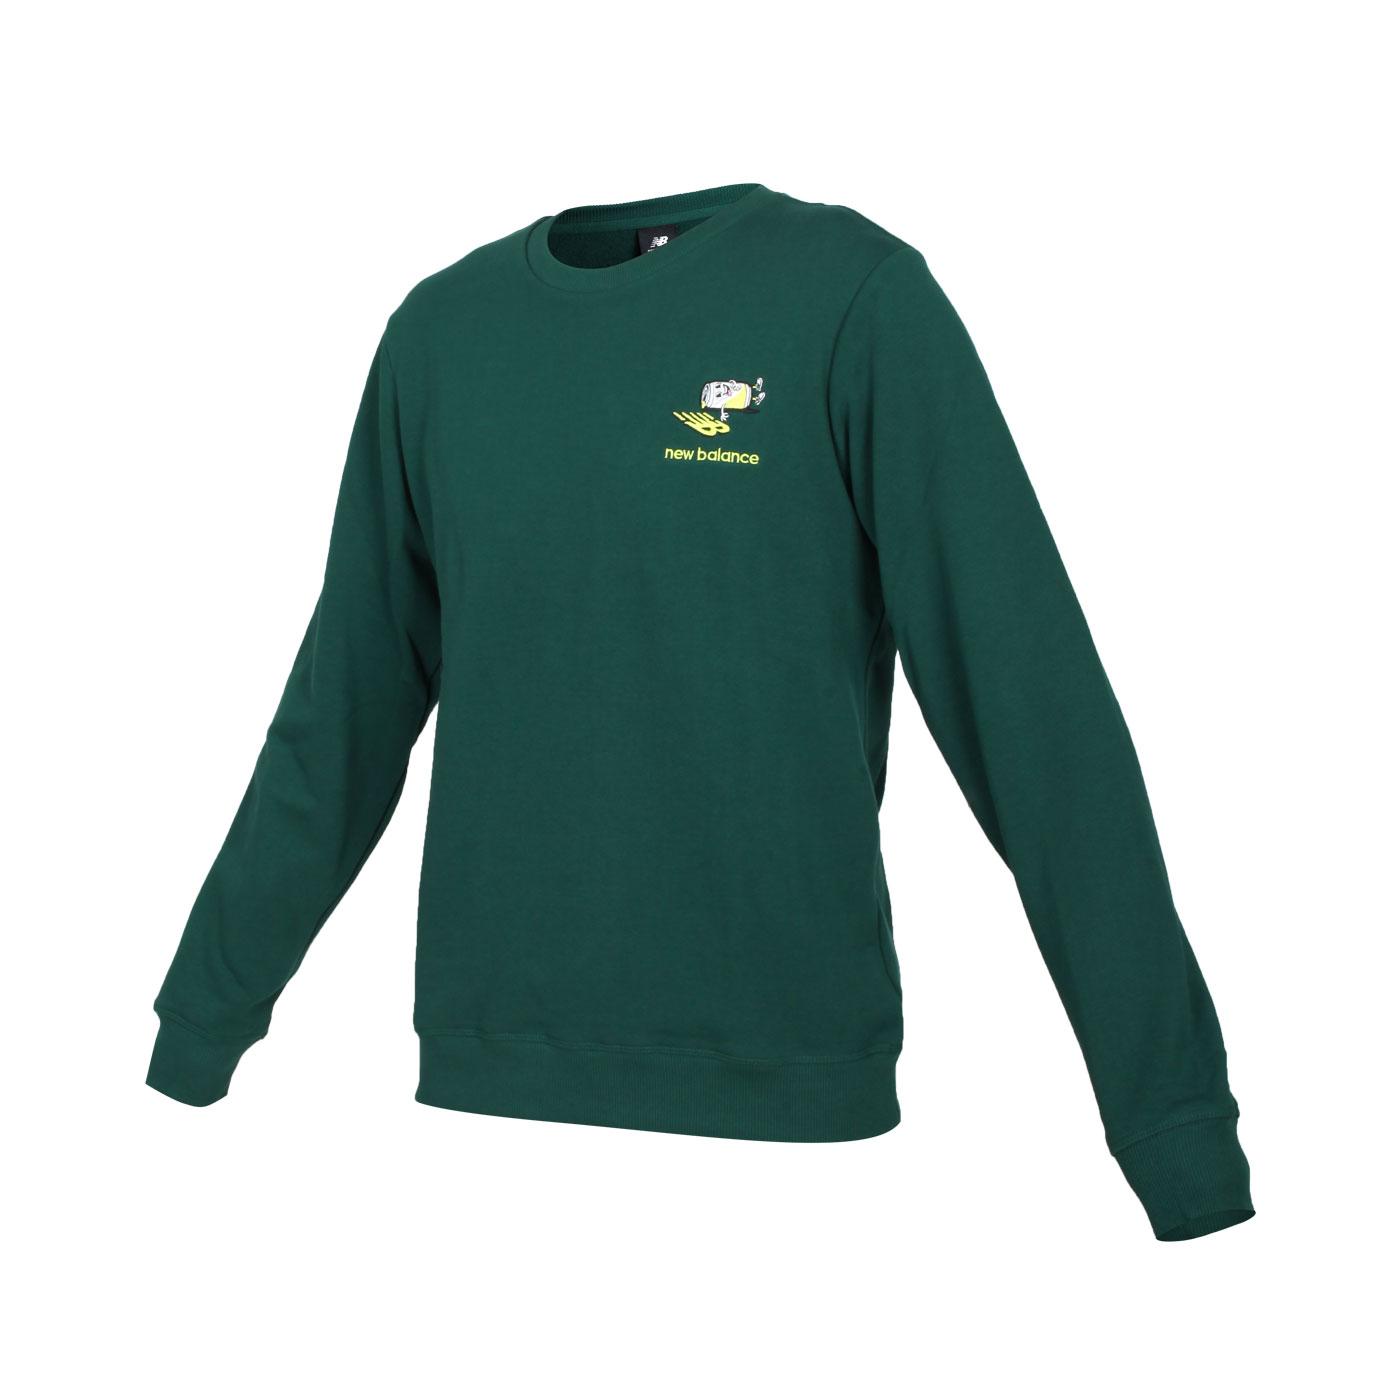 NEW BALANCE 男款圓領長袖T恤 AMT13572NWG - 深綠螢光綠